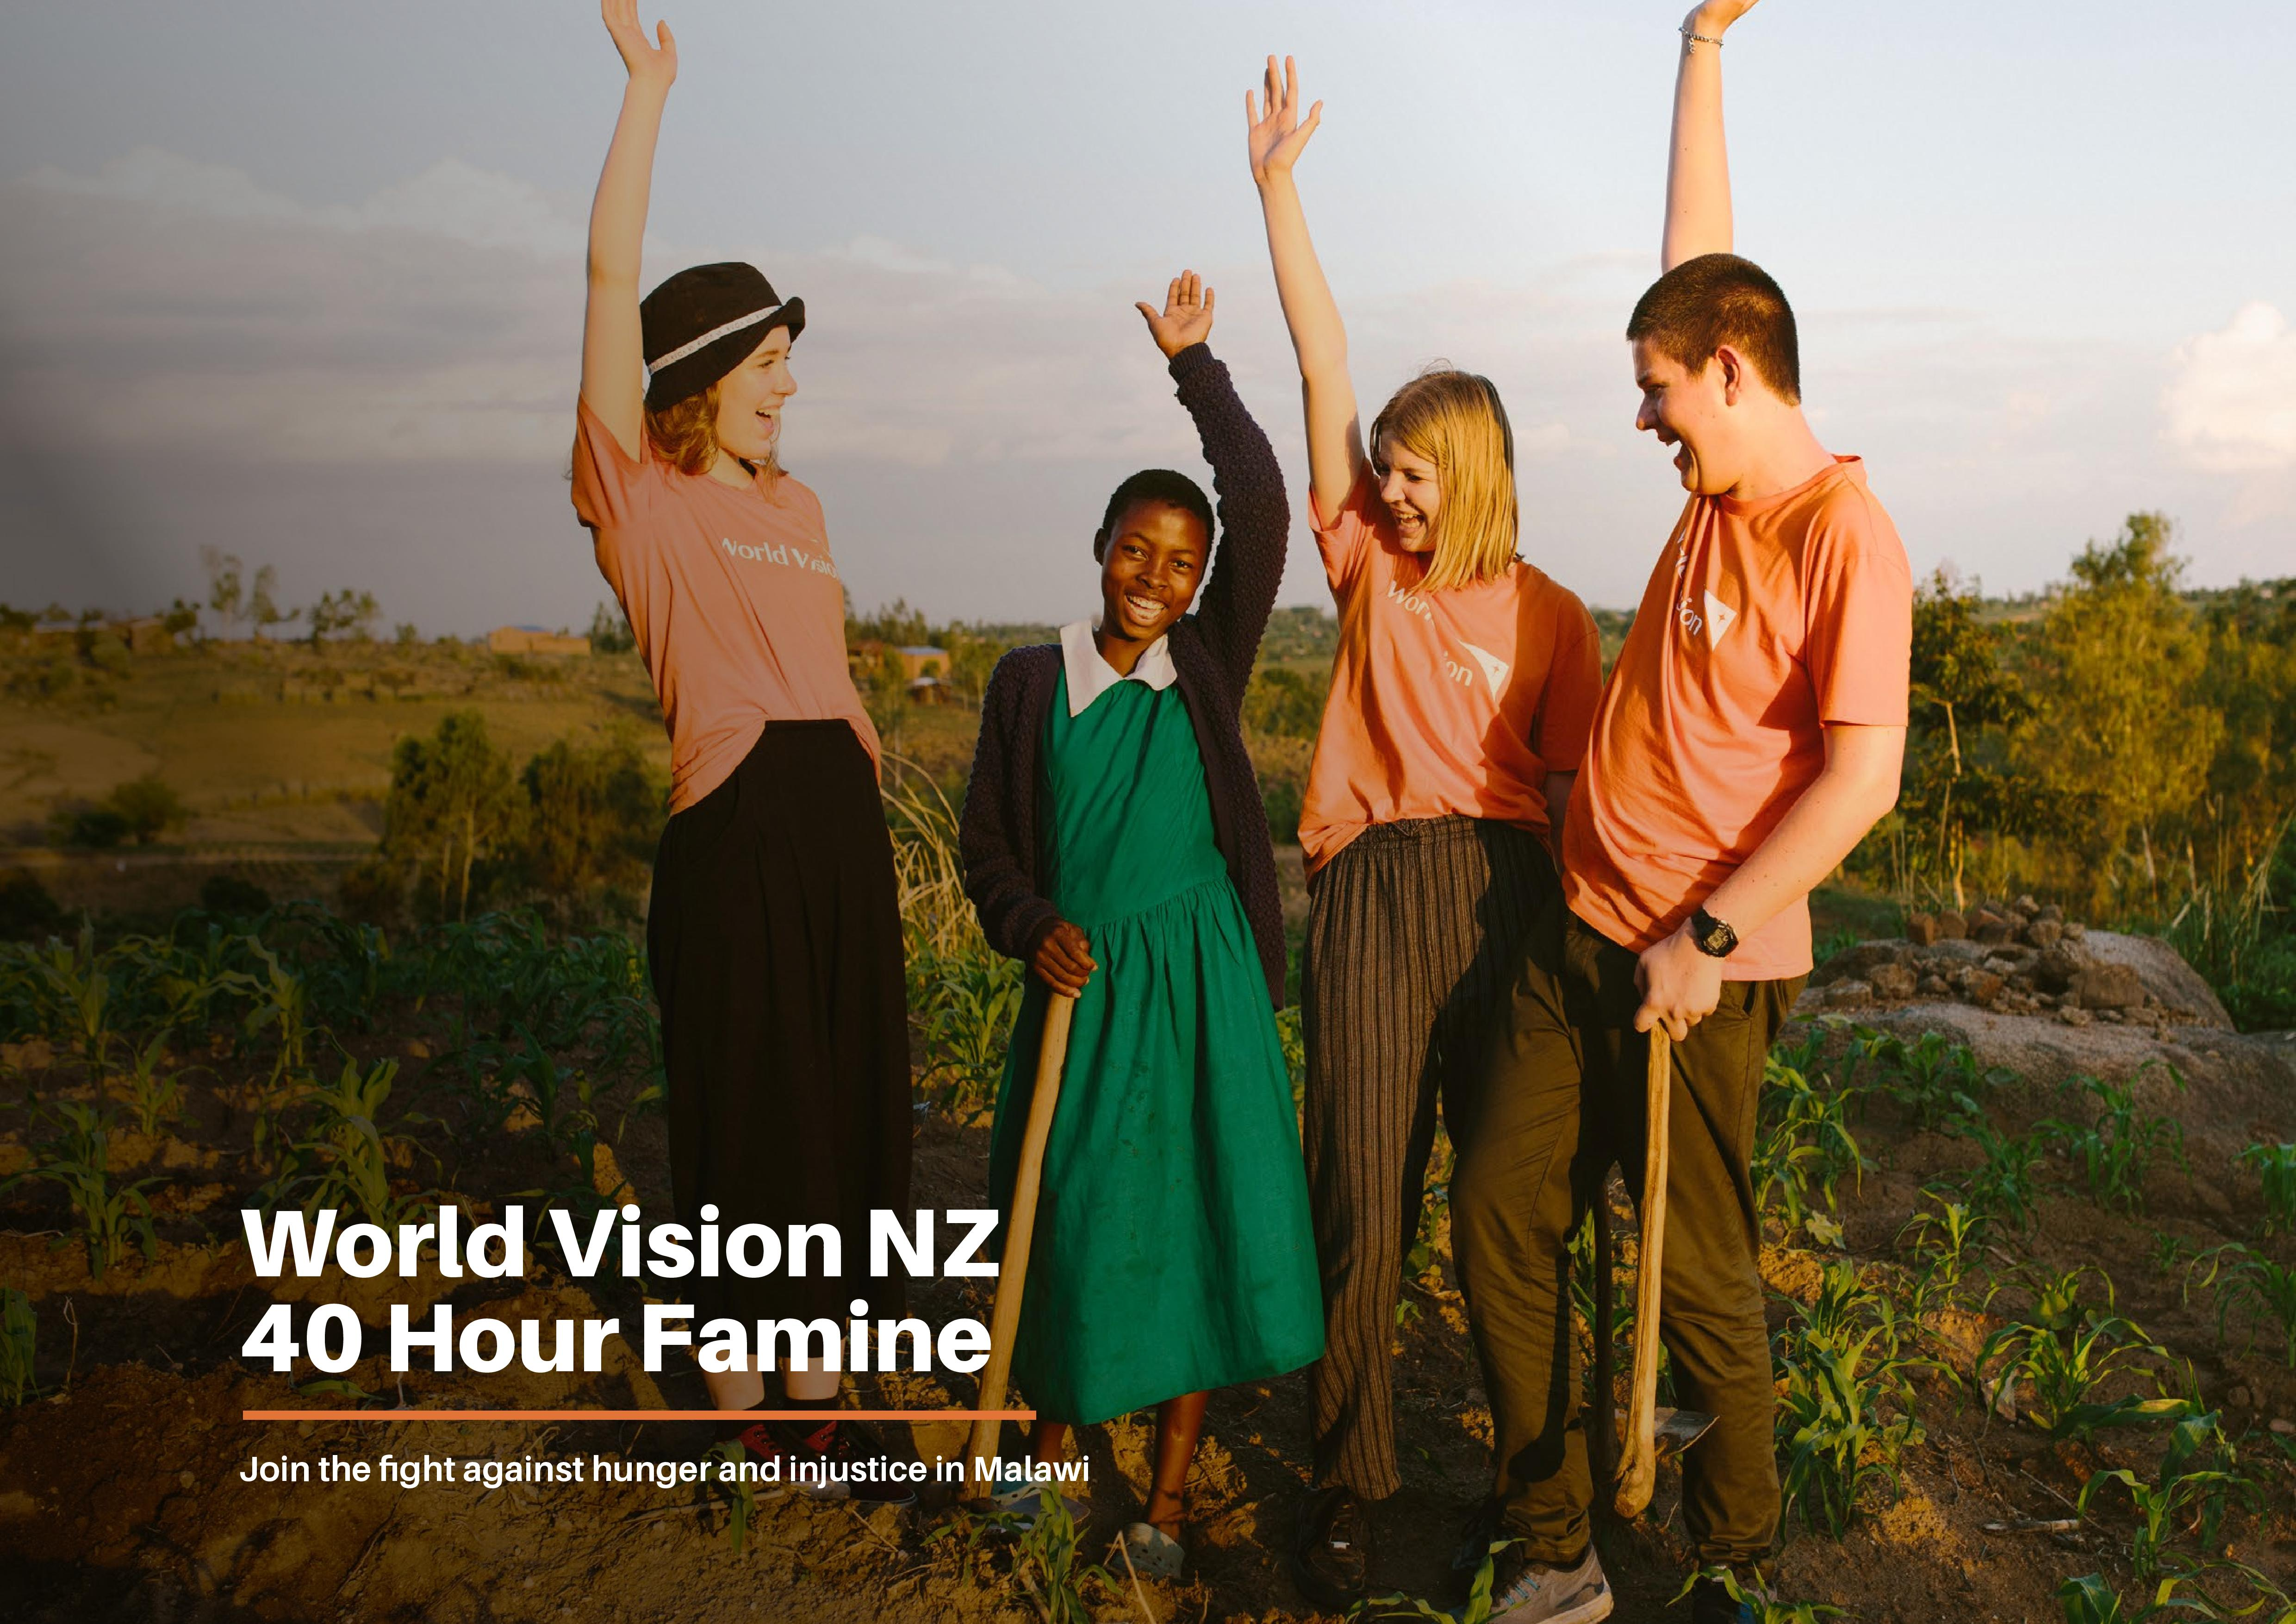 World Vision NZ Peer-to-Peer (P2P) Fundraising Platform